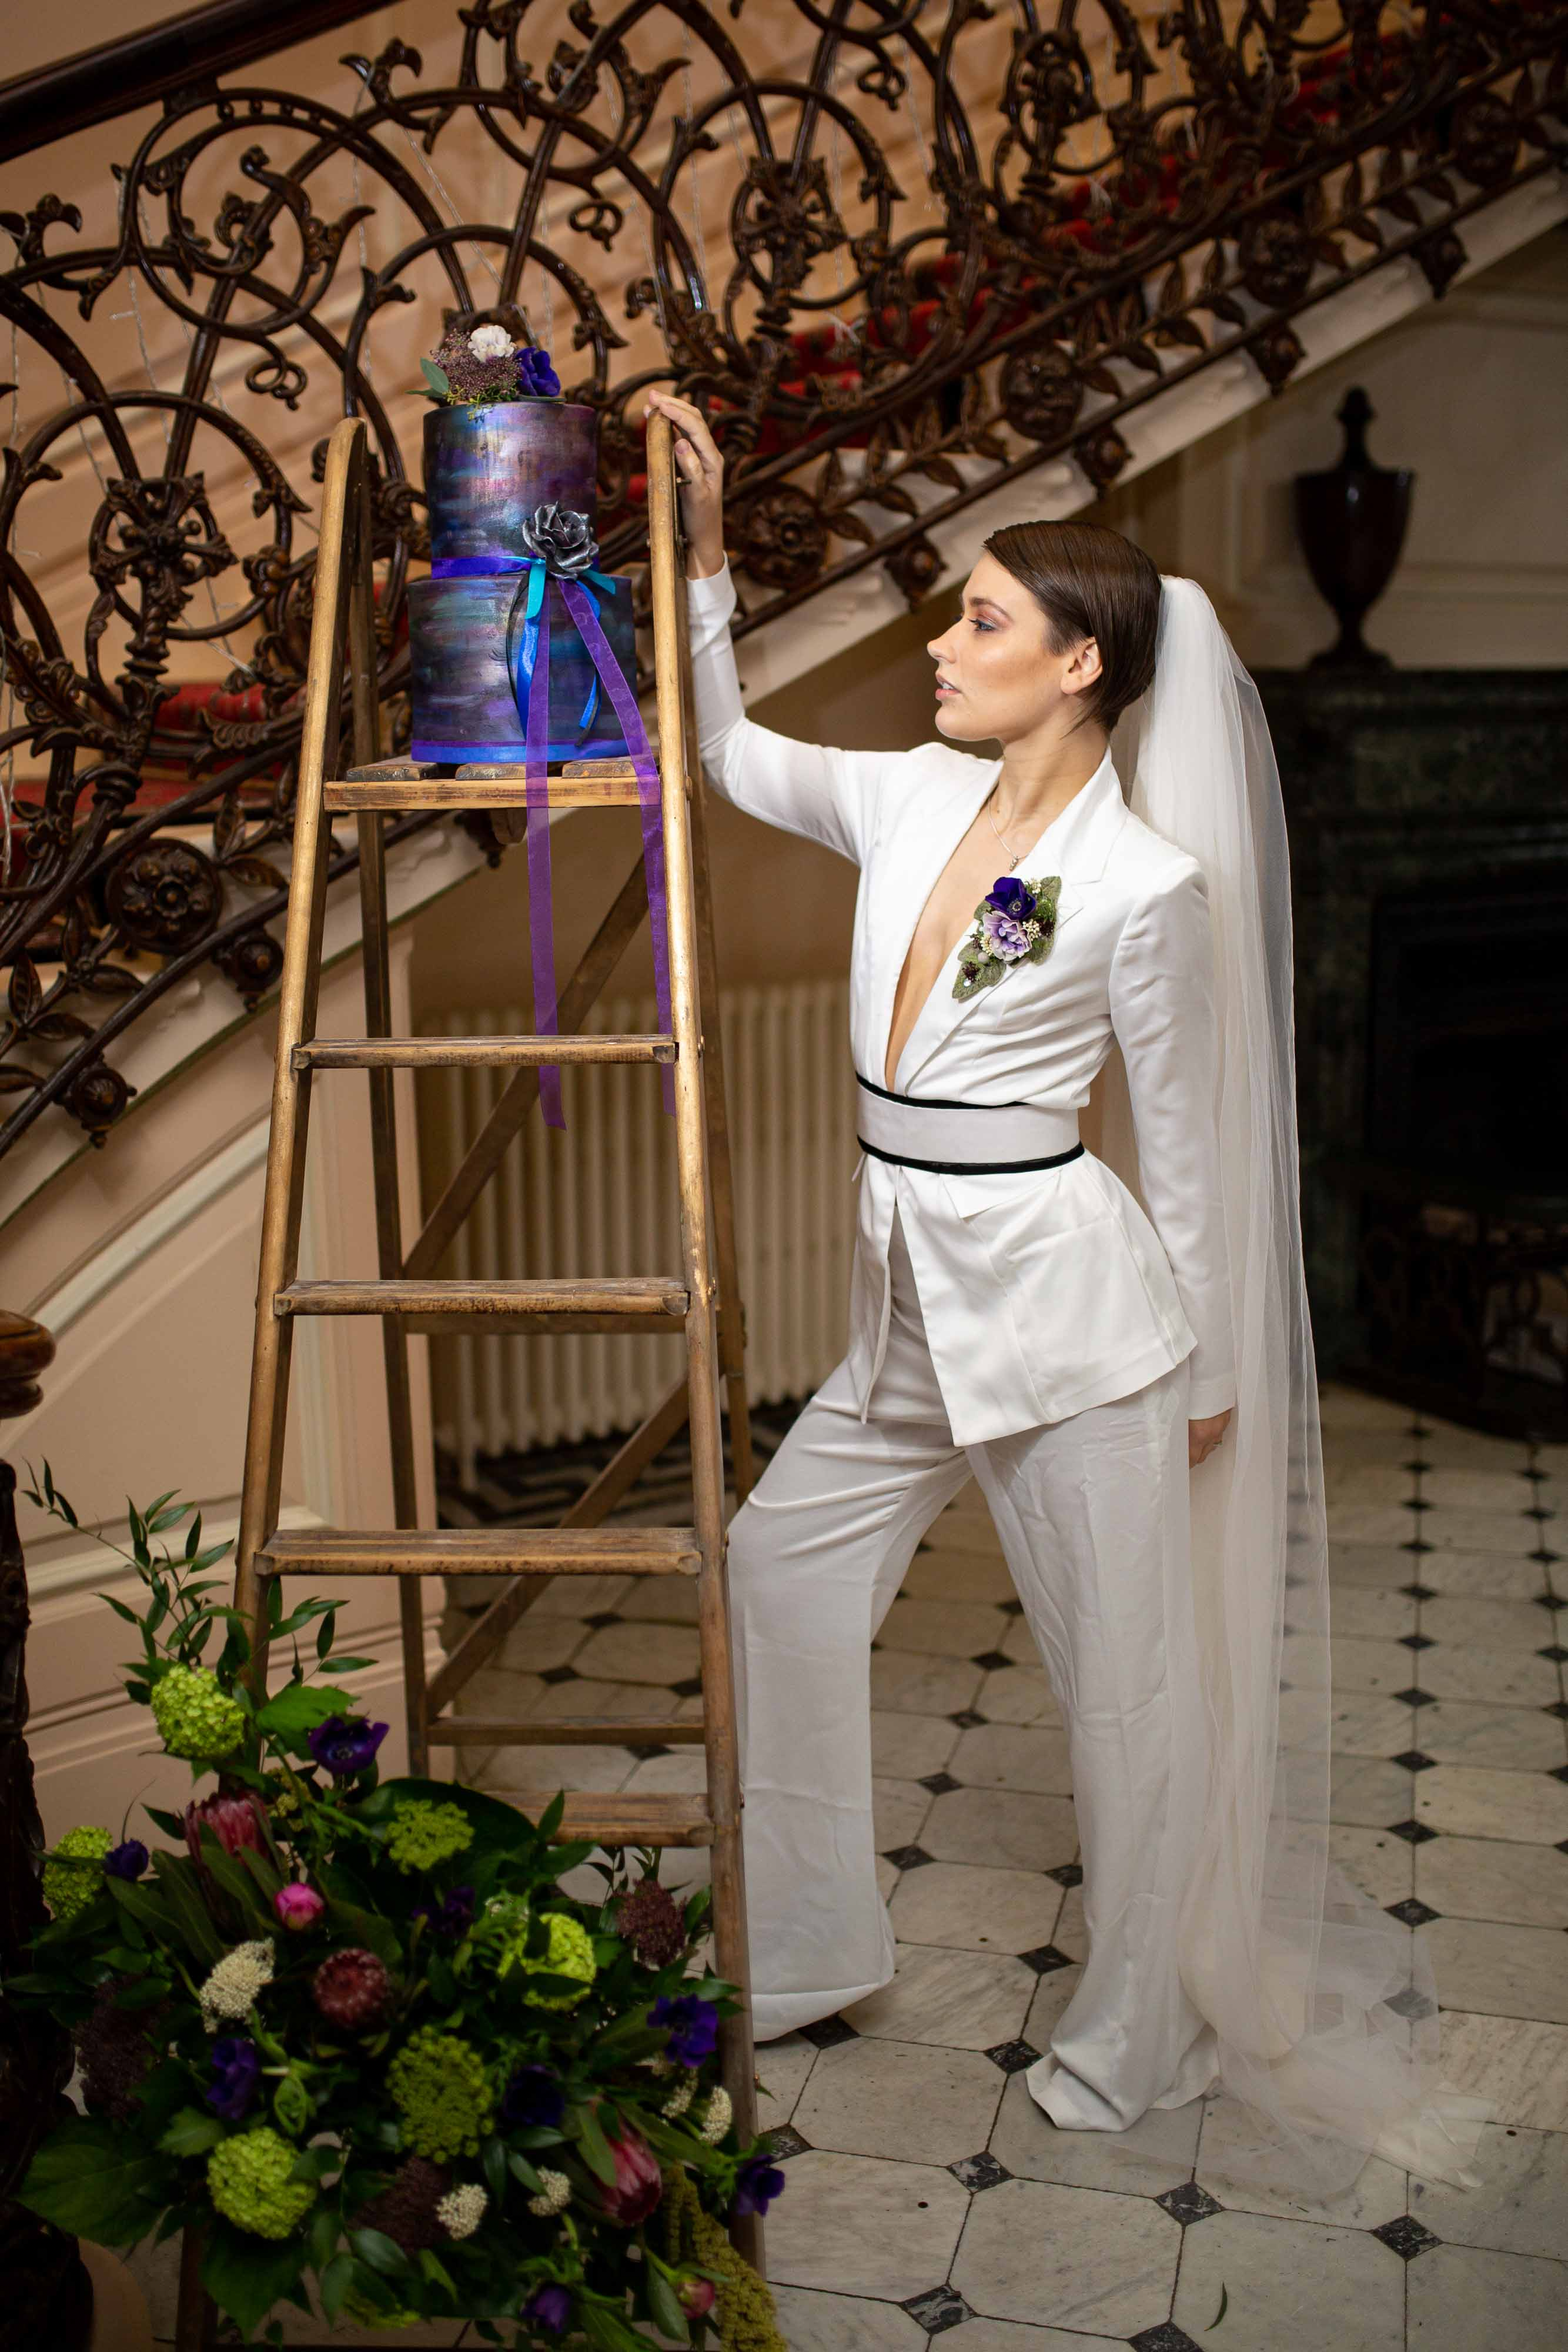 iconic wedding looks- music themed wedding- unconventional wedding- alternative wedding- alternative bridalwear- womens wedding suit- annie lennox style- unique wedding cake